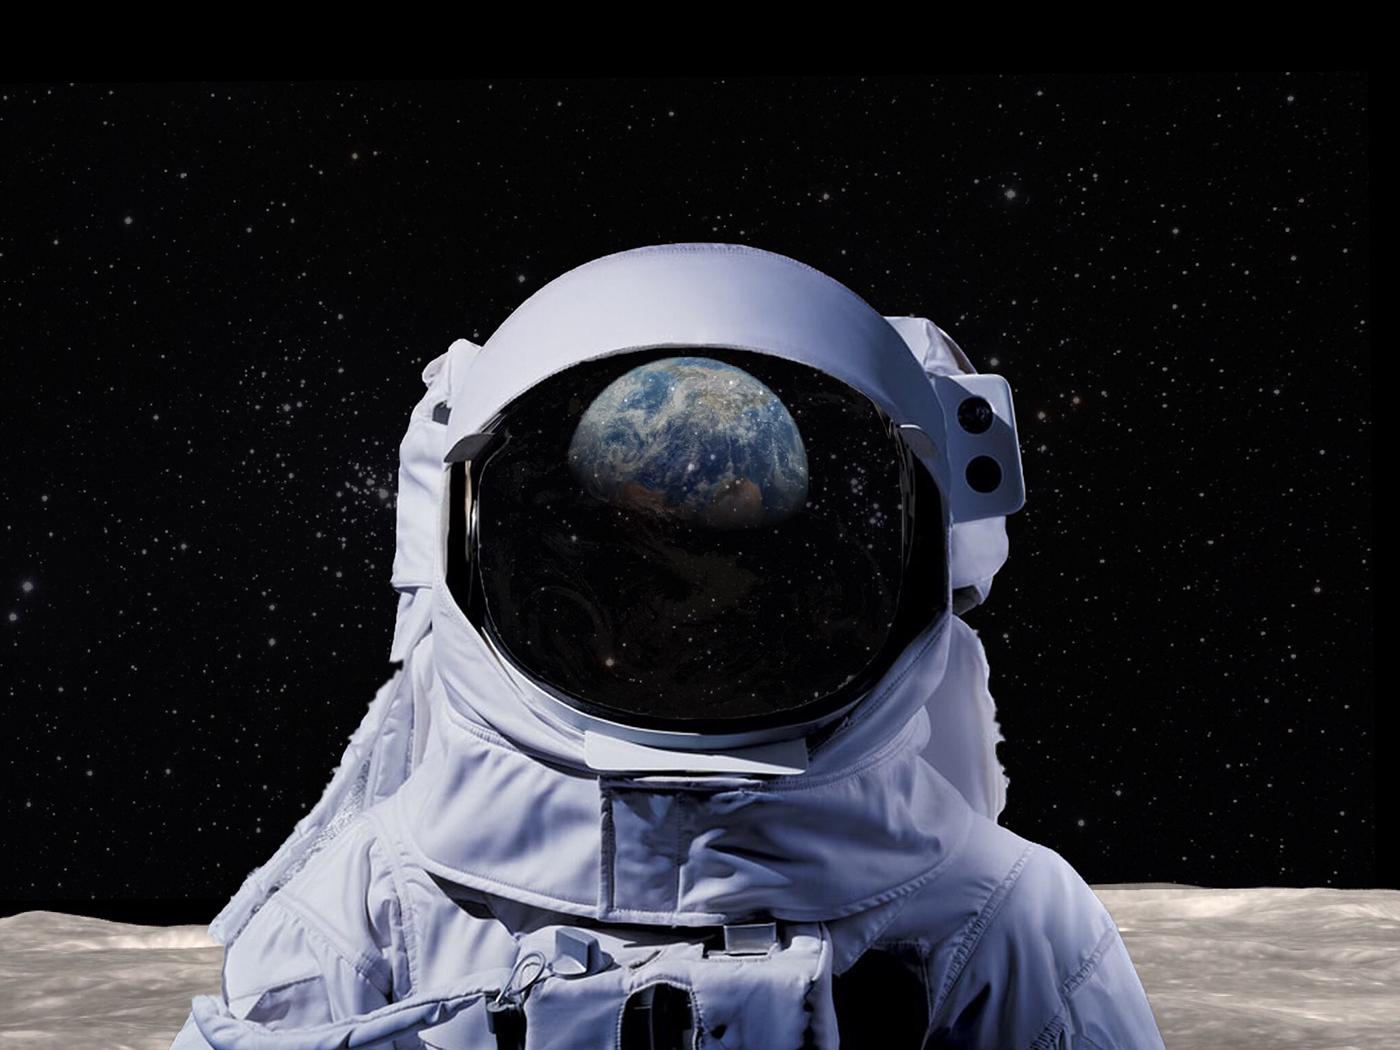 картинки космонавта шлем балетной студии имела